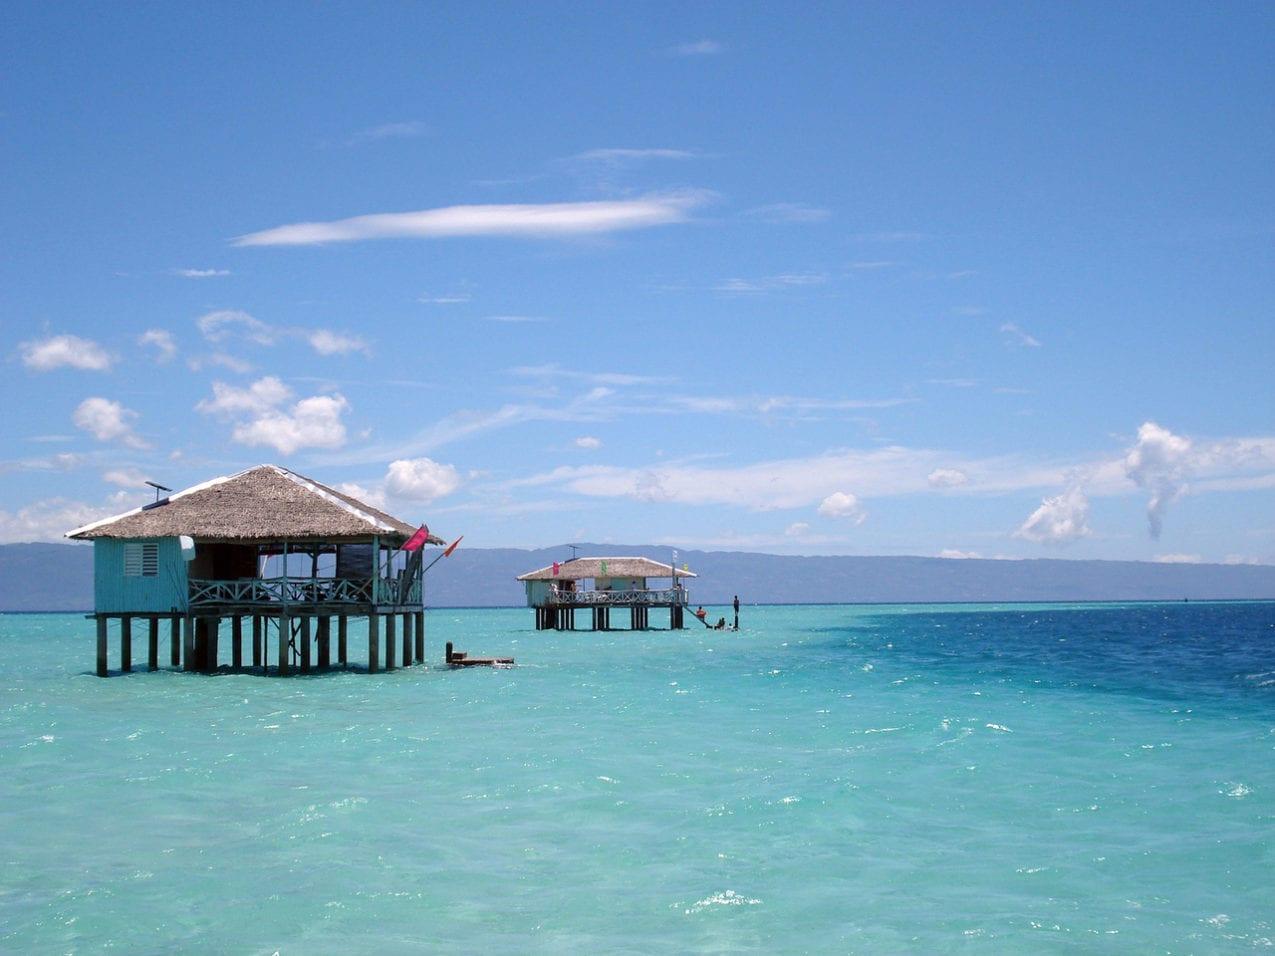 Isla de Negros